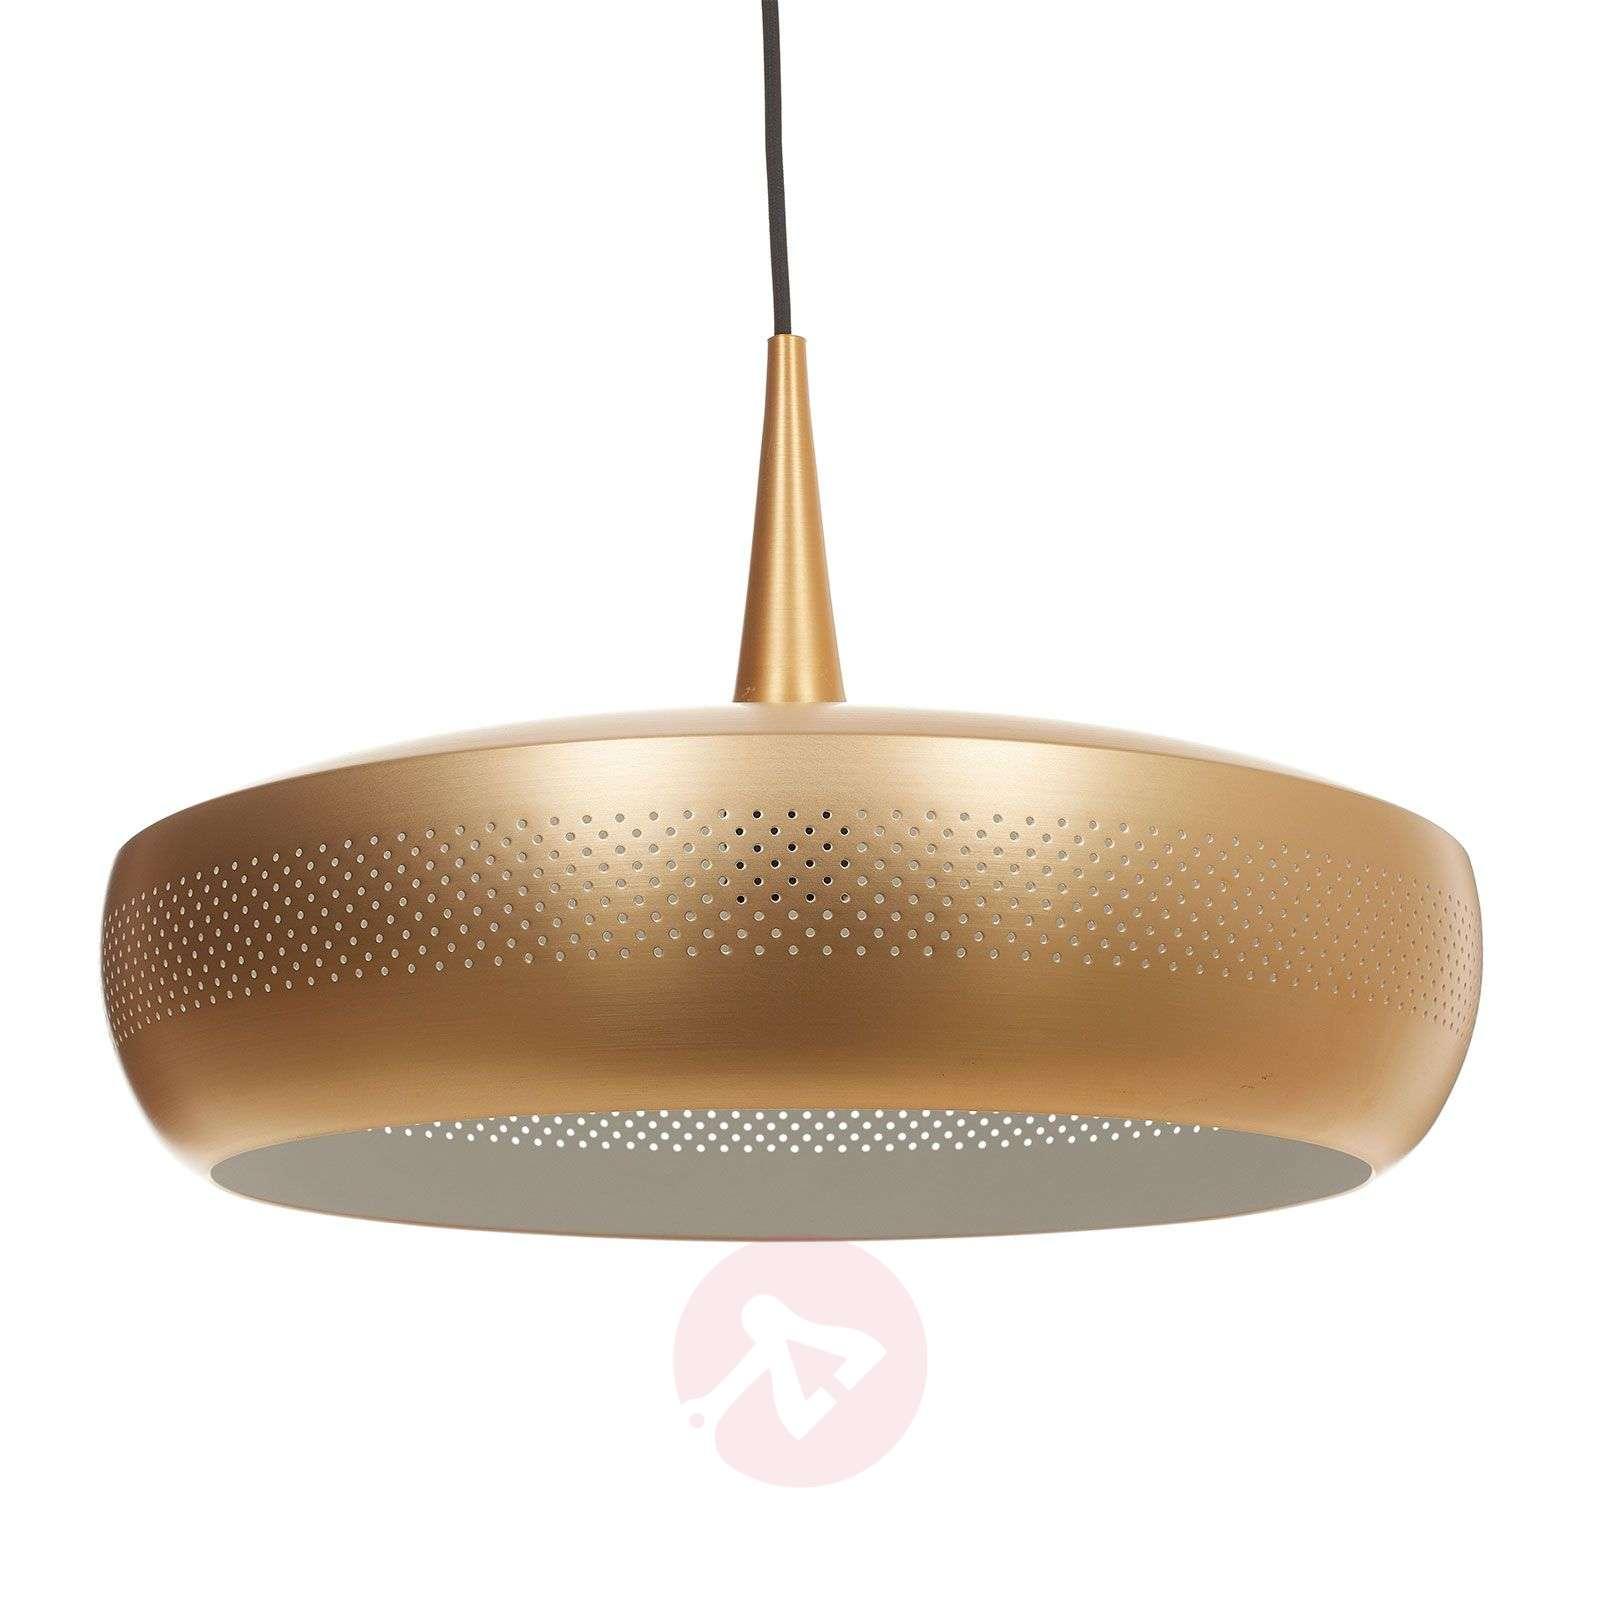 UMAGE Clava Dine hanging lamp brass-9521070-01